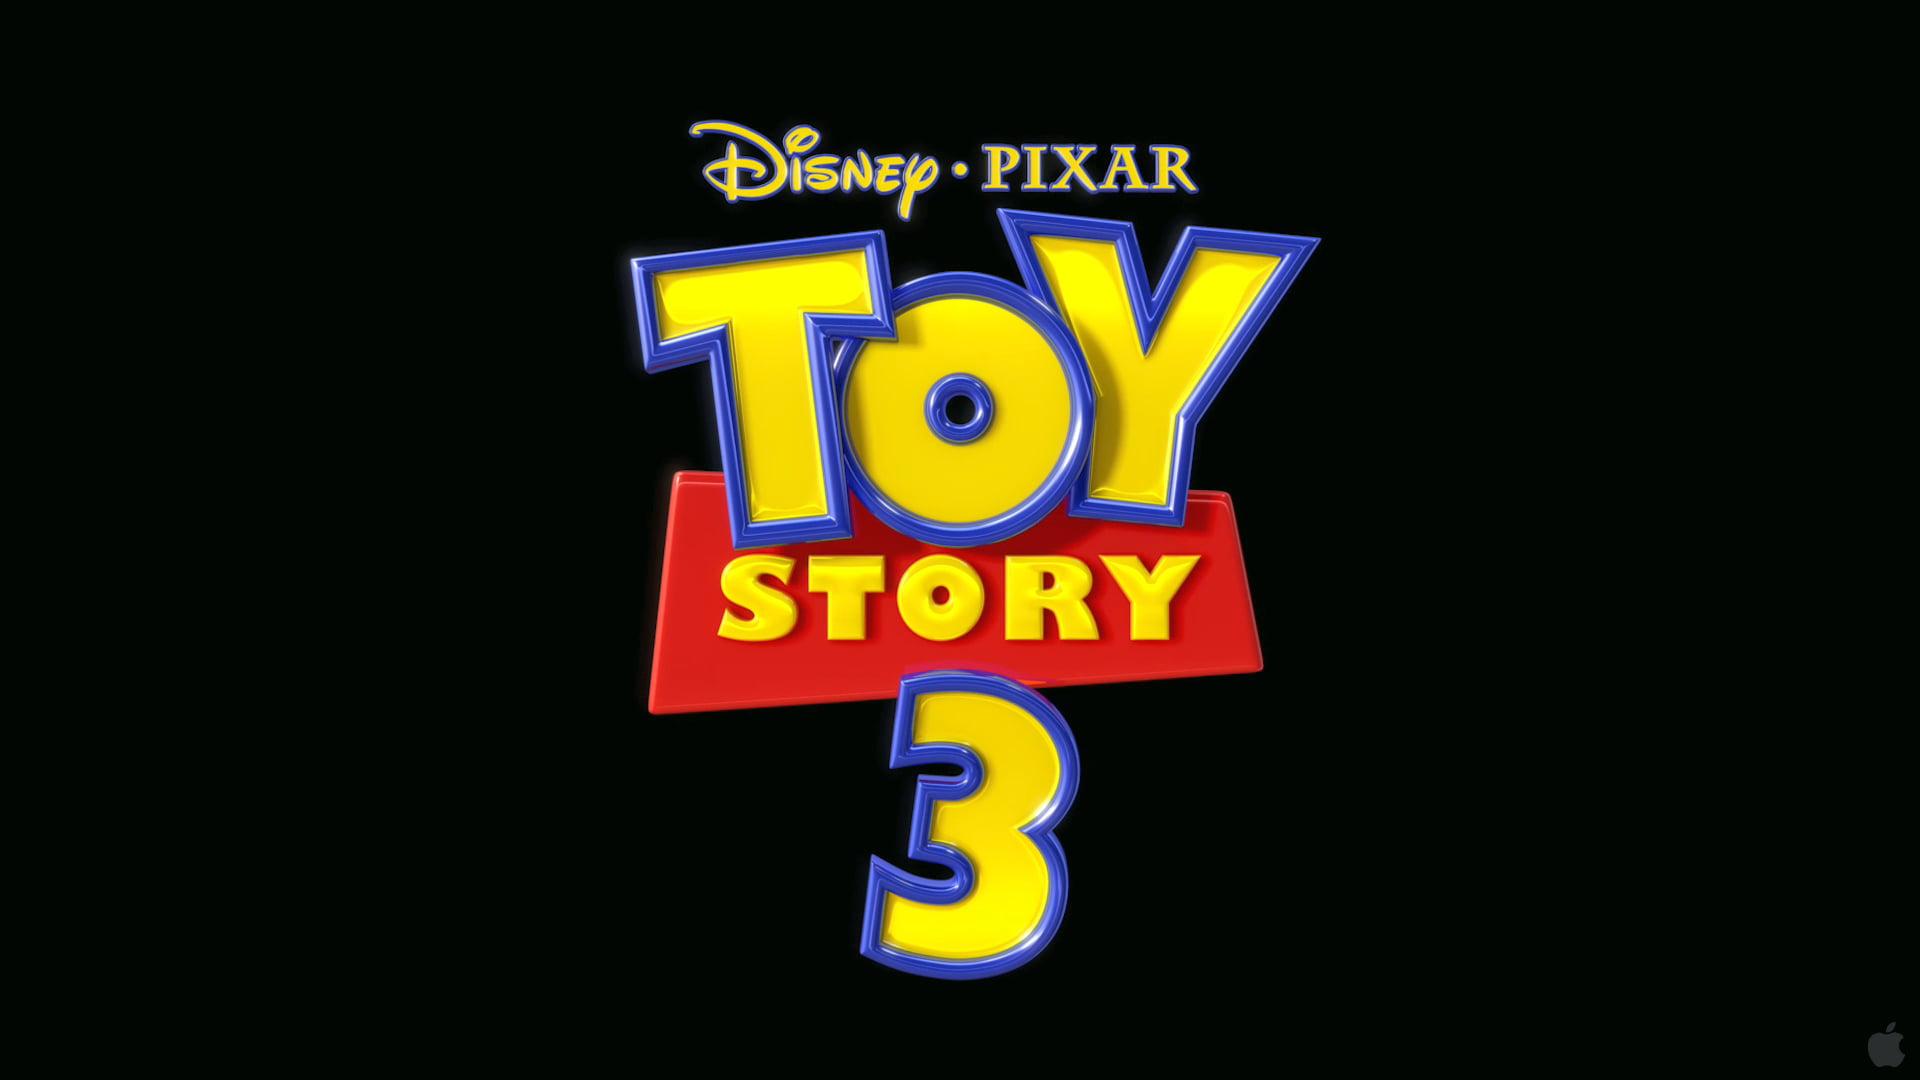 Disney Pixar Toy Story 3 logo, movies, Toy Story, animated.